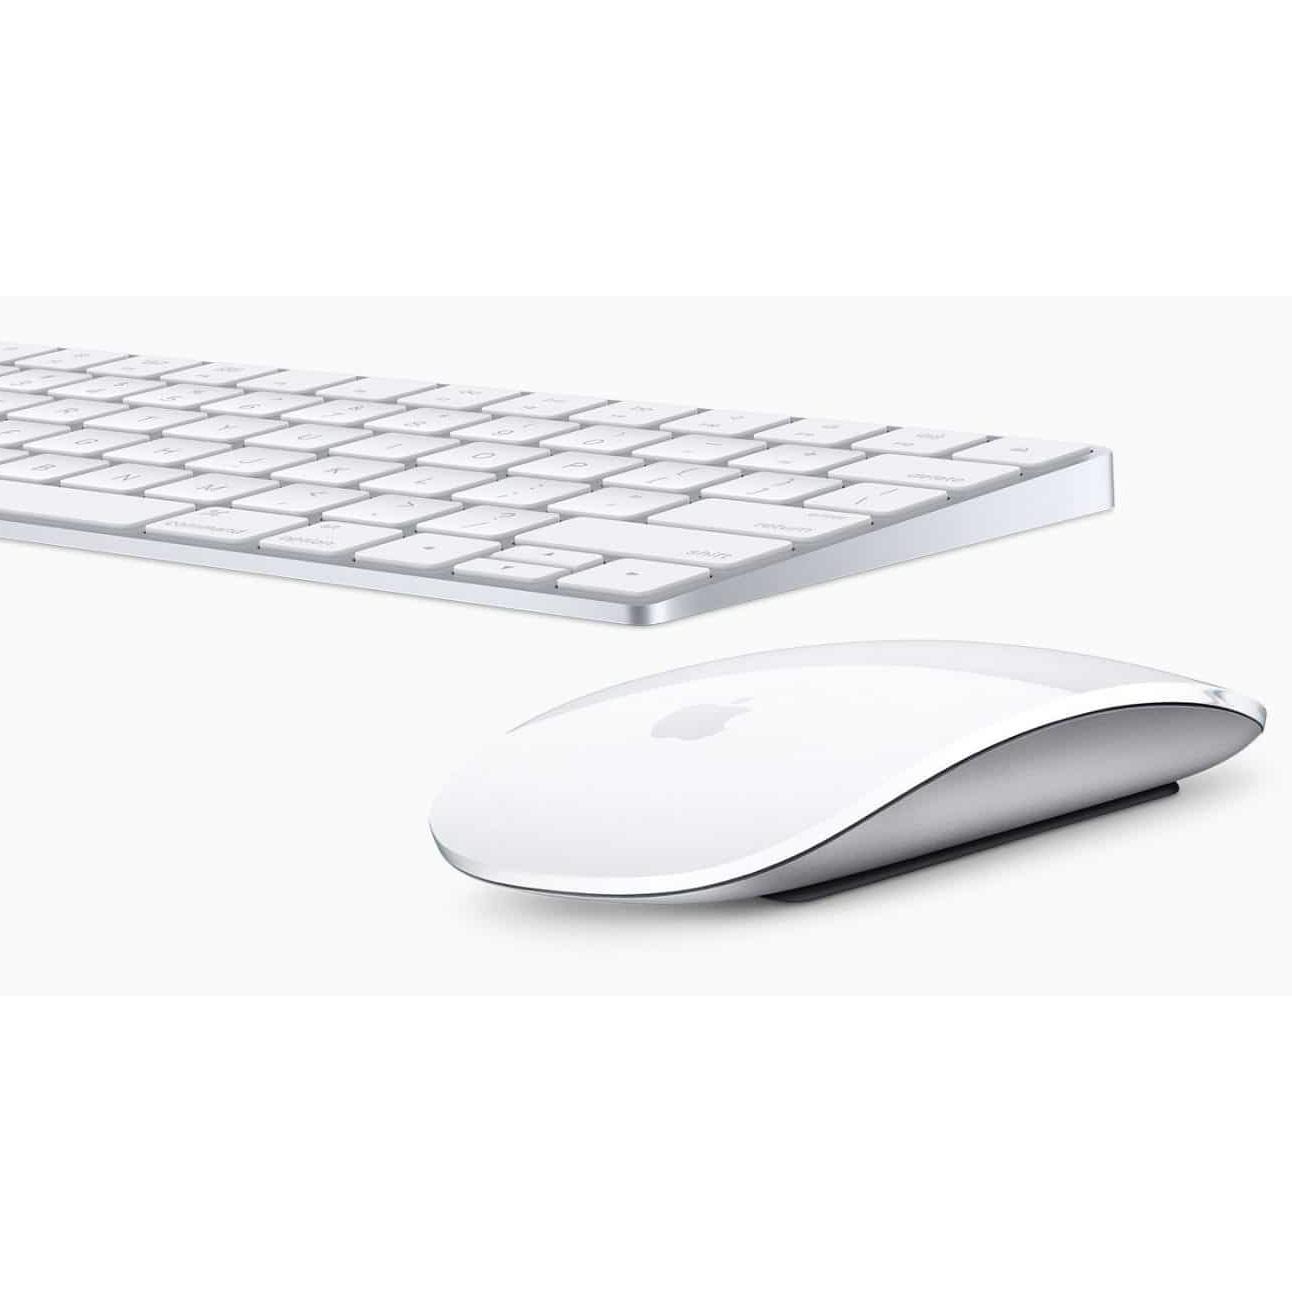 Apple Magic Mouse 2 Silver - Chính hãng VN / MLA02ZA